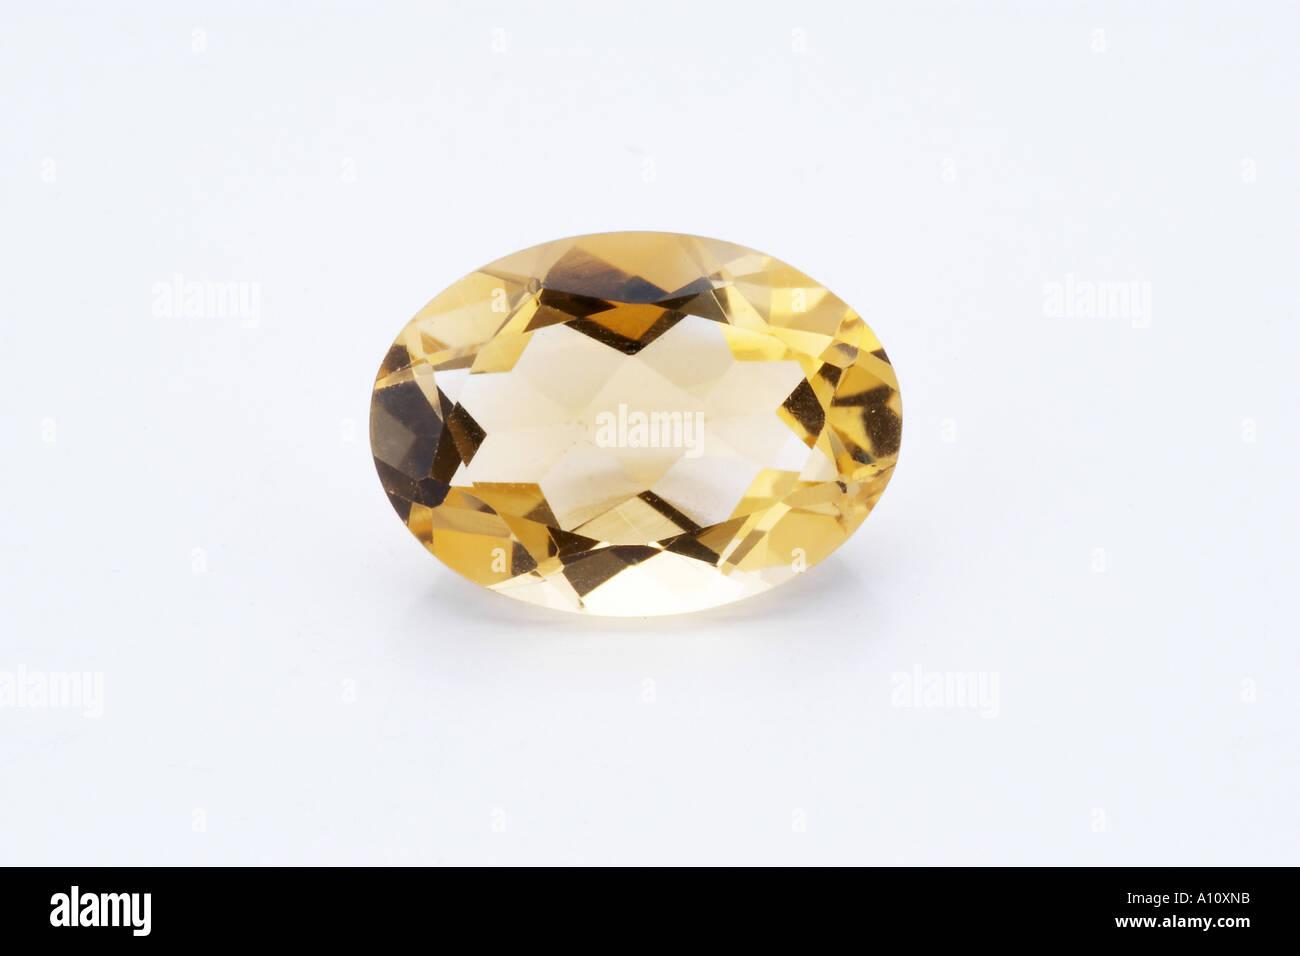 One single piece of oval shaped shining glittering star warm yellowish coloured Citrine Semi Precious Stone on white background - Stock Image